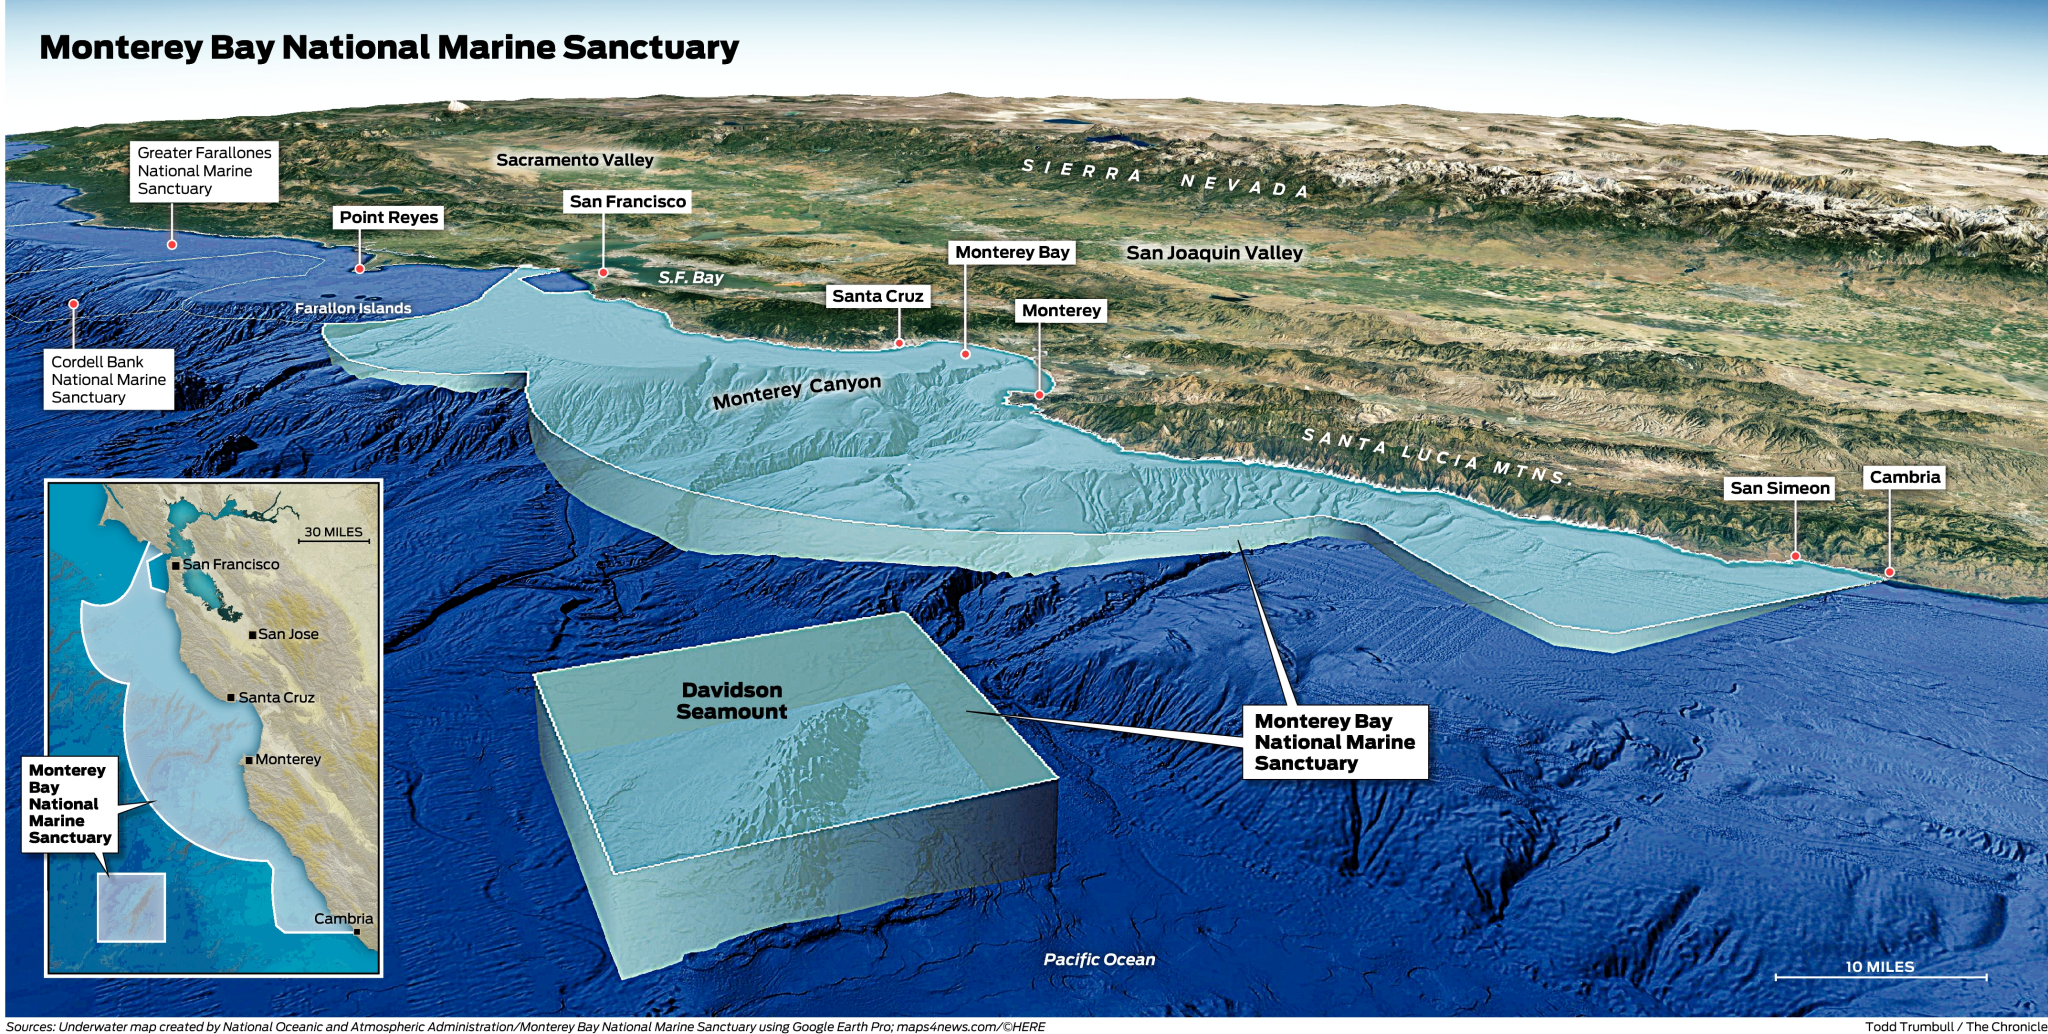 Monterey Bay marine sanctuary turns 25 years old